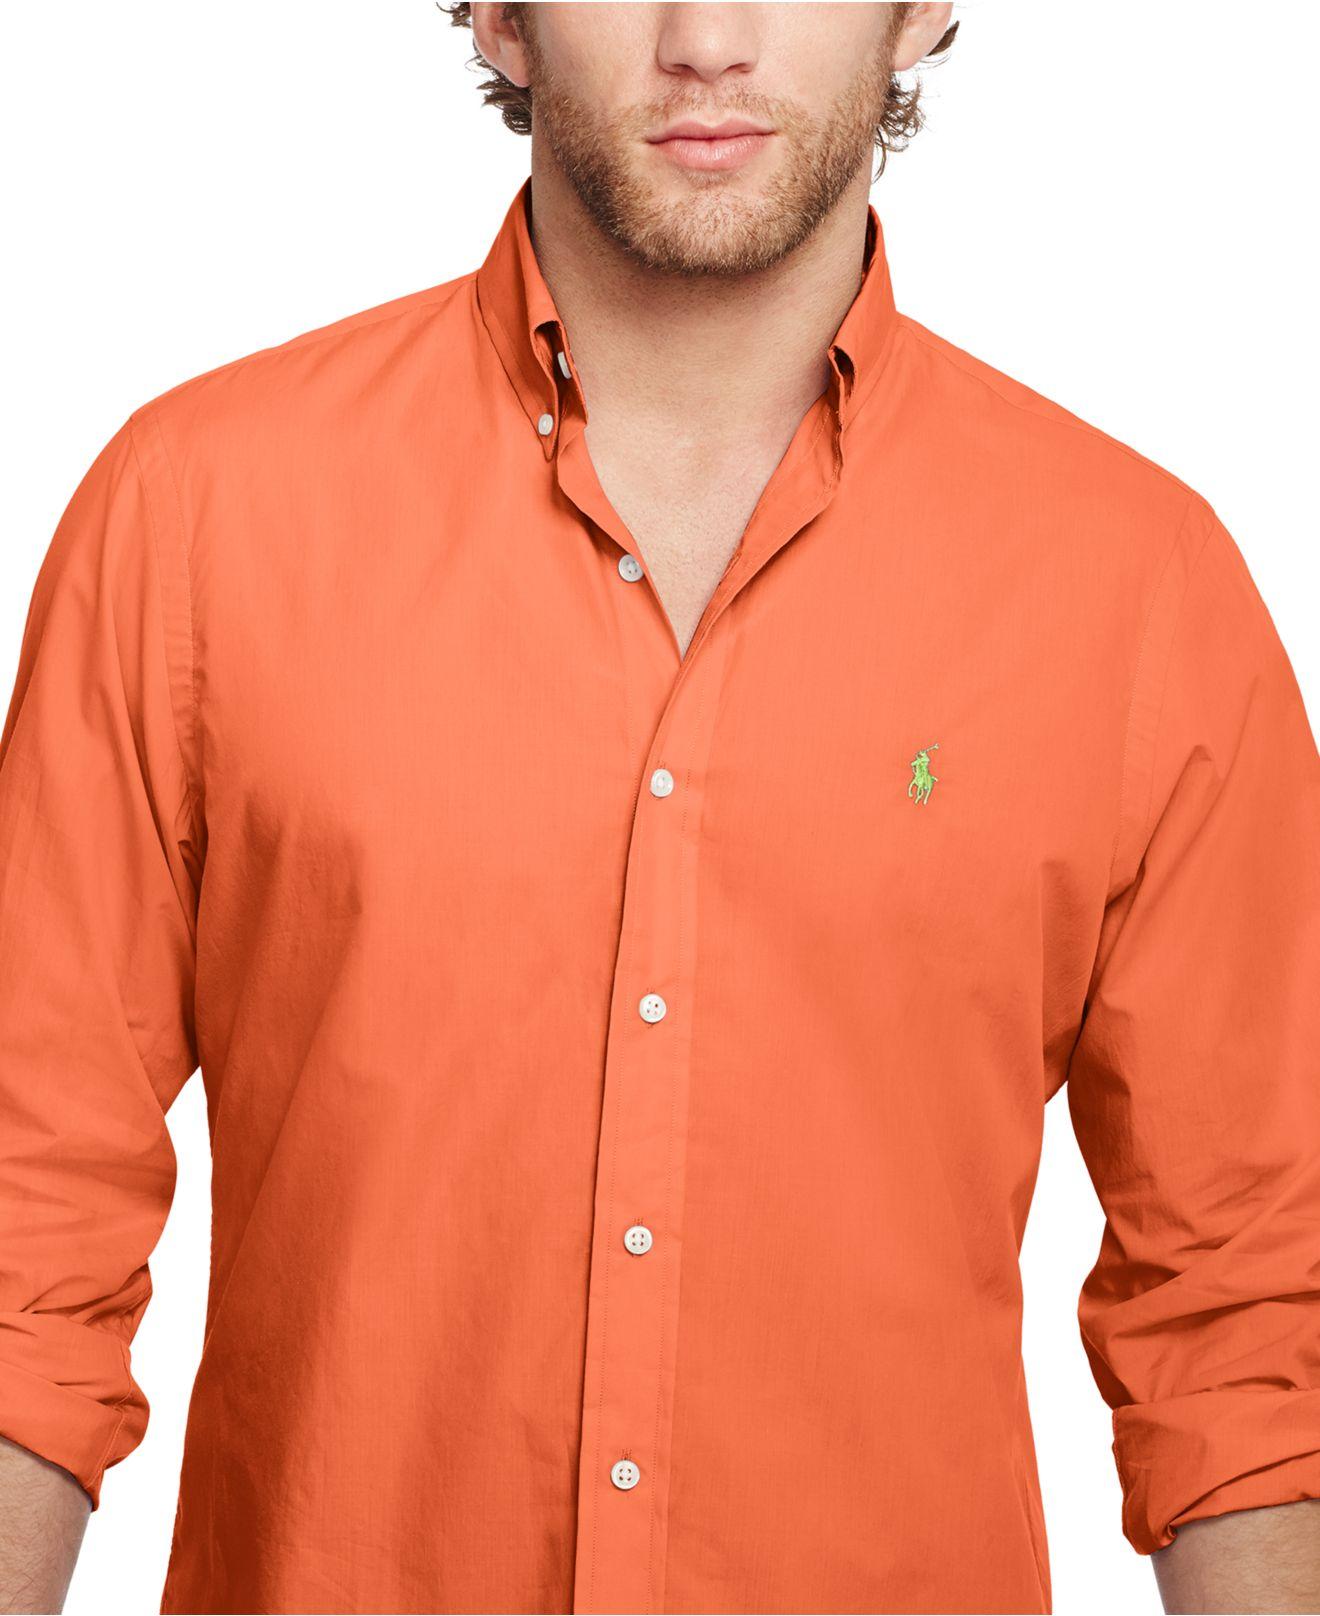 0e158935f Polo Ralph Lauren Solid Poplin Shirt in Orange for Men - Lyst